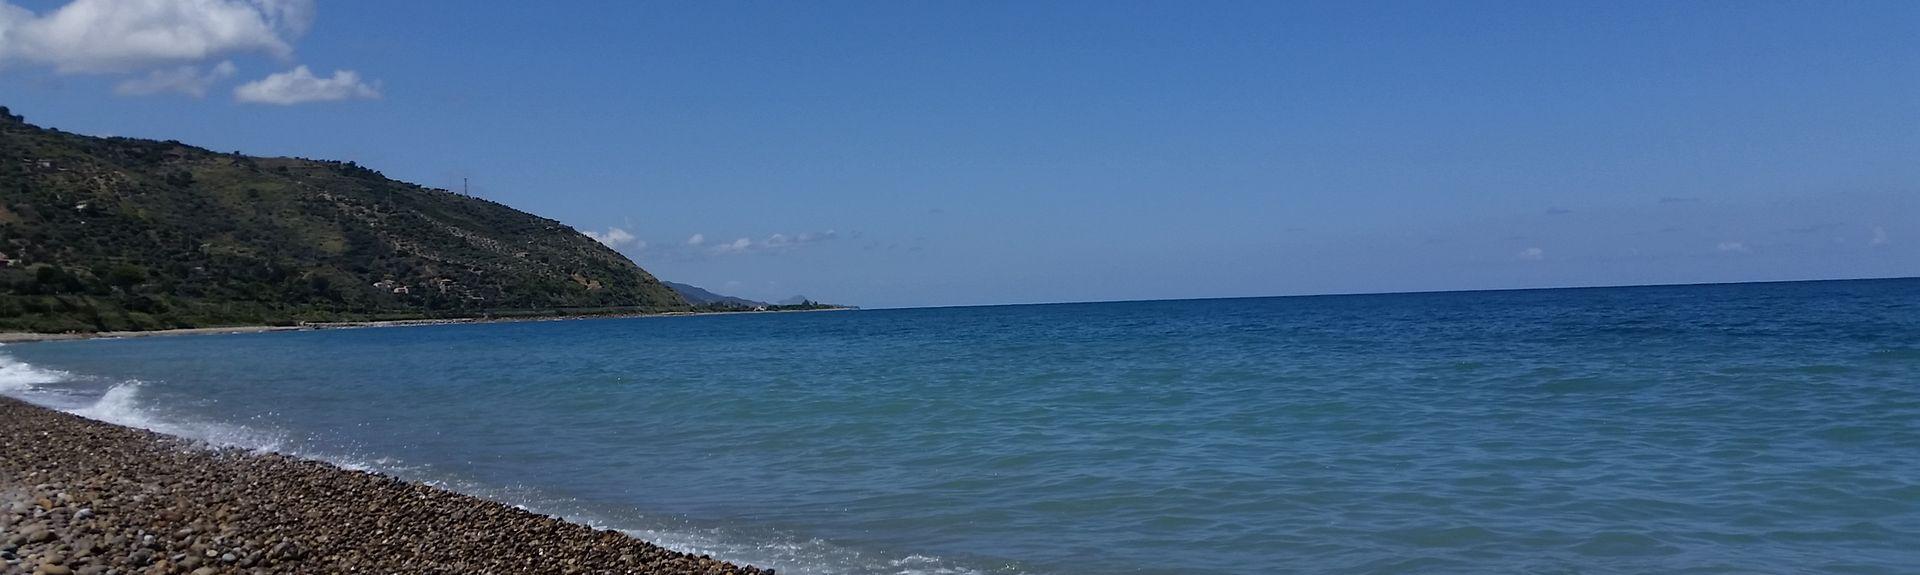 Caronia, Sicilië, Italië